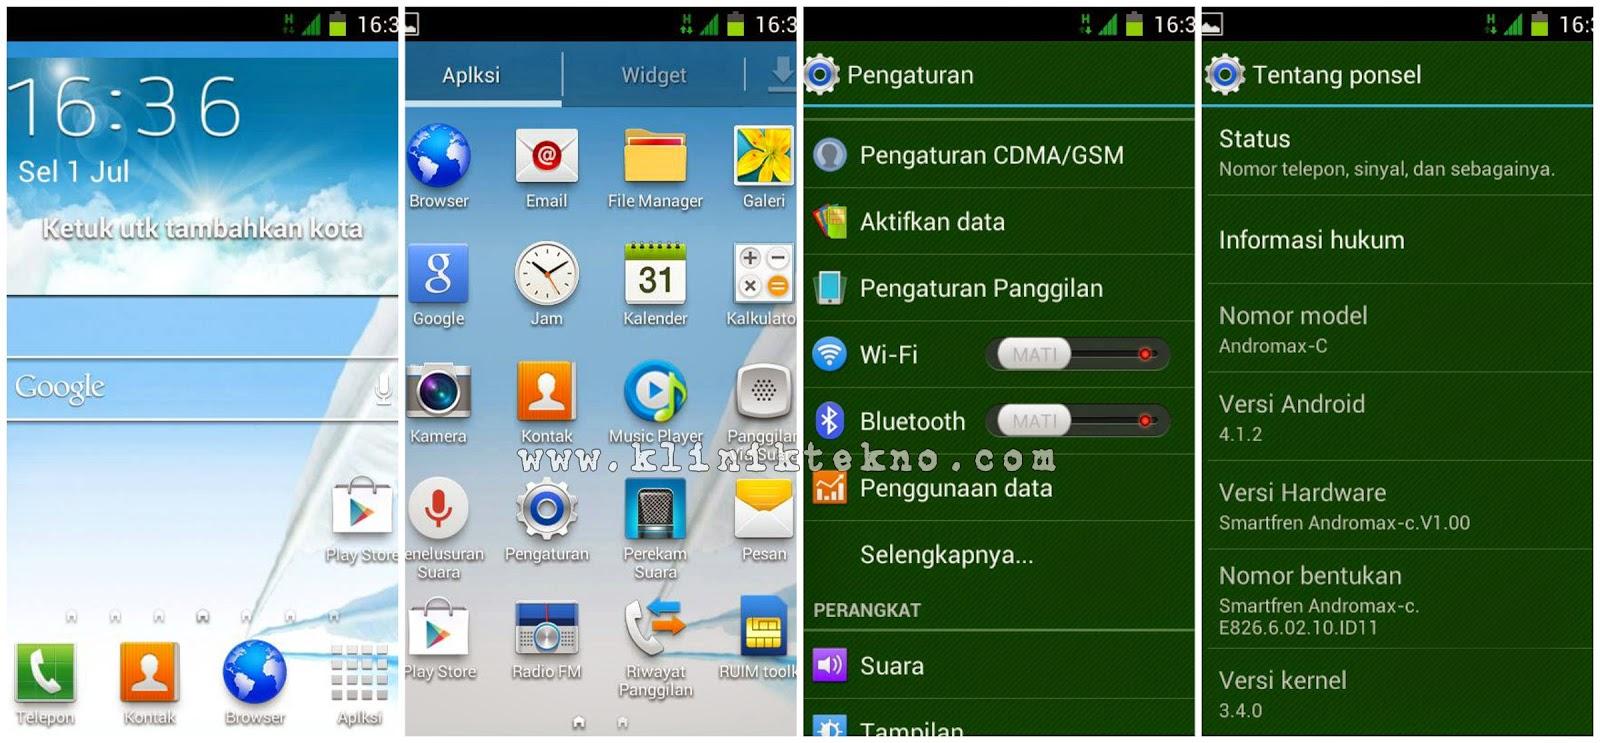 Update Custom Rom Samsung Galaxy S4 For Andromax G AD687G